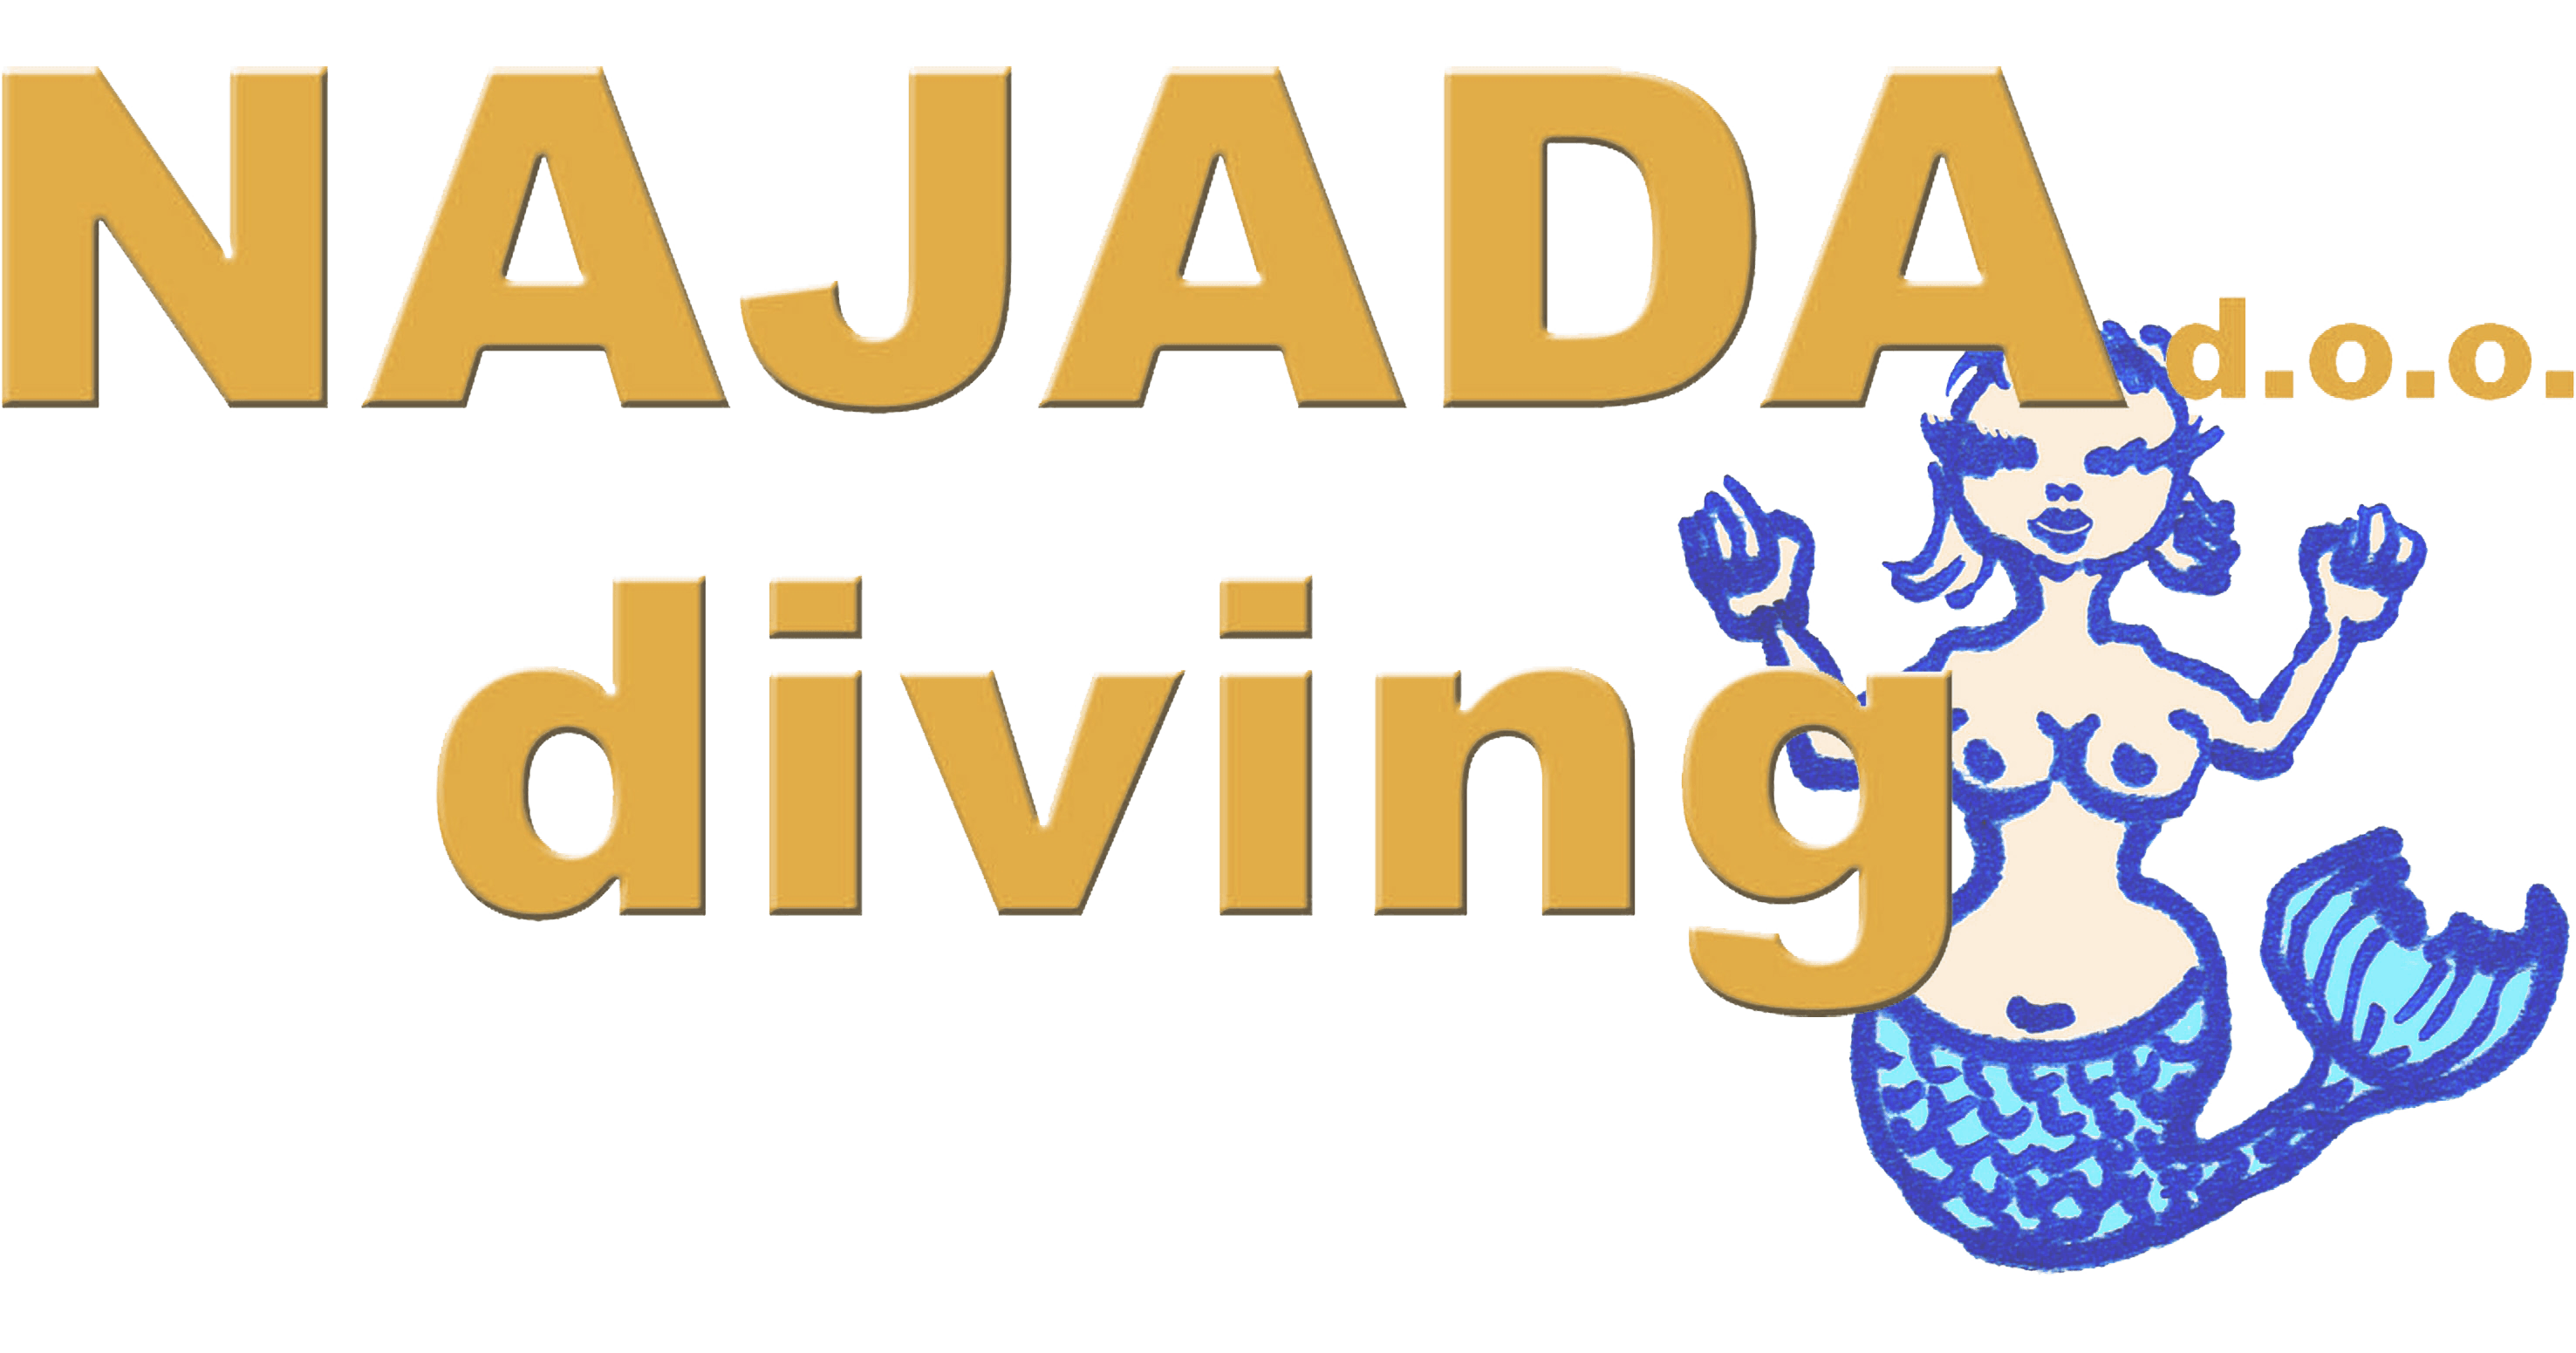 logonajadagross remastered - Najada diving